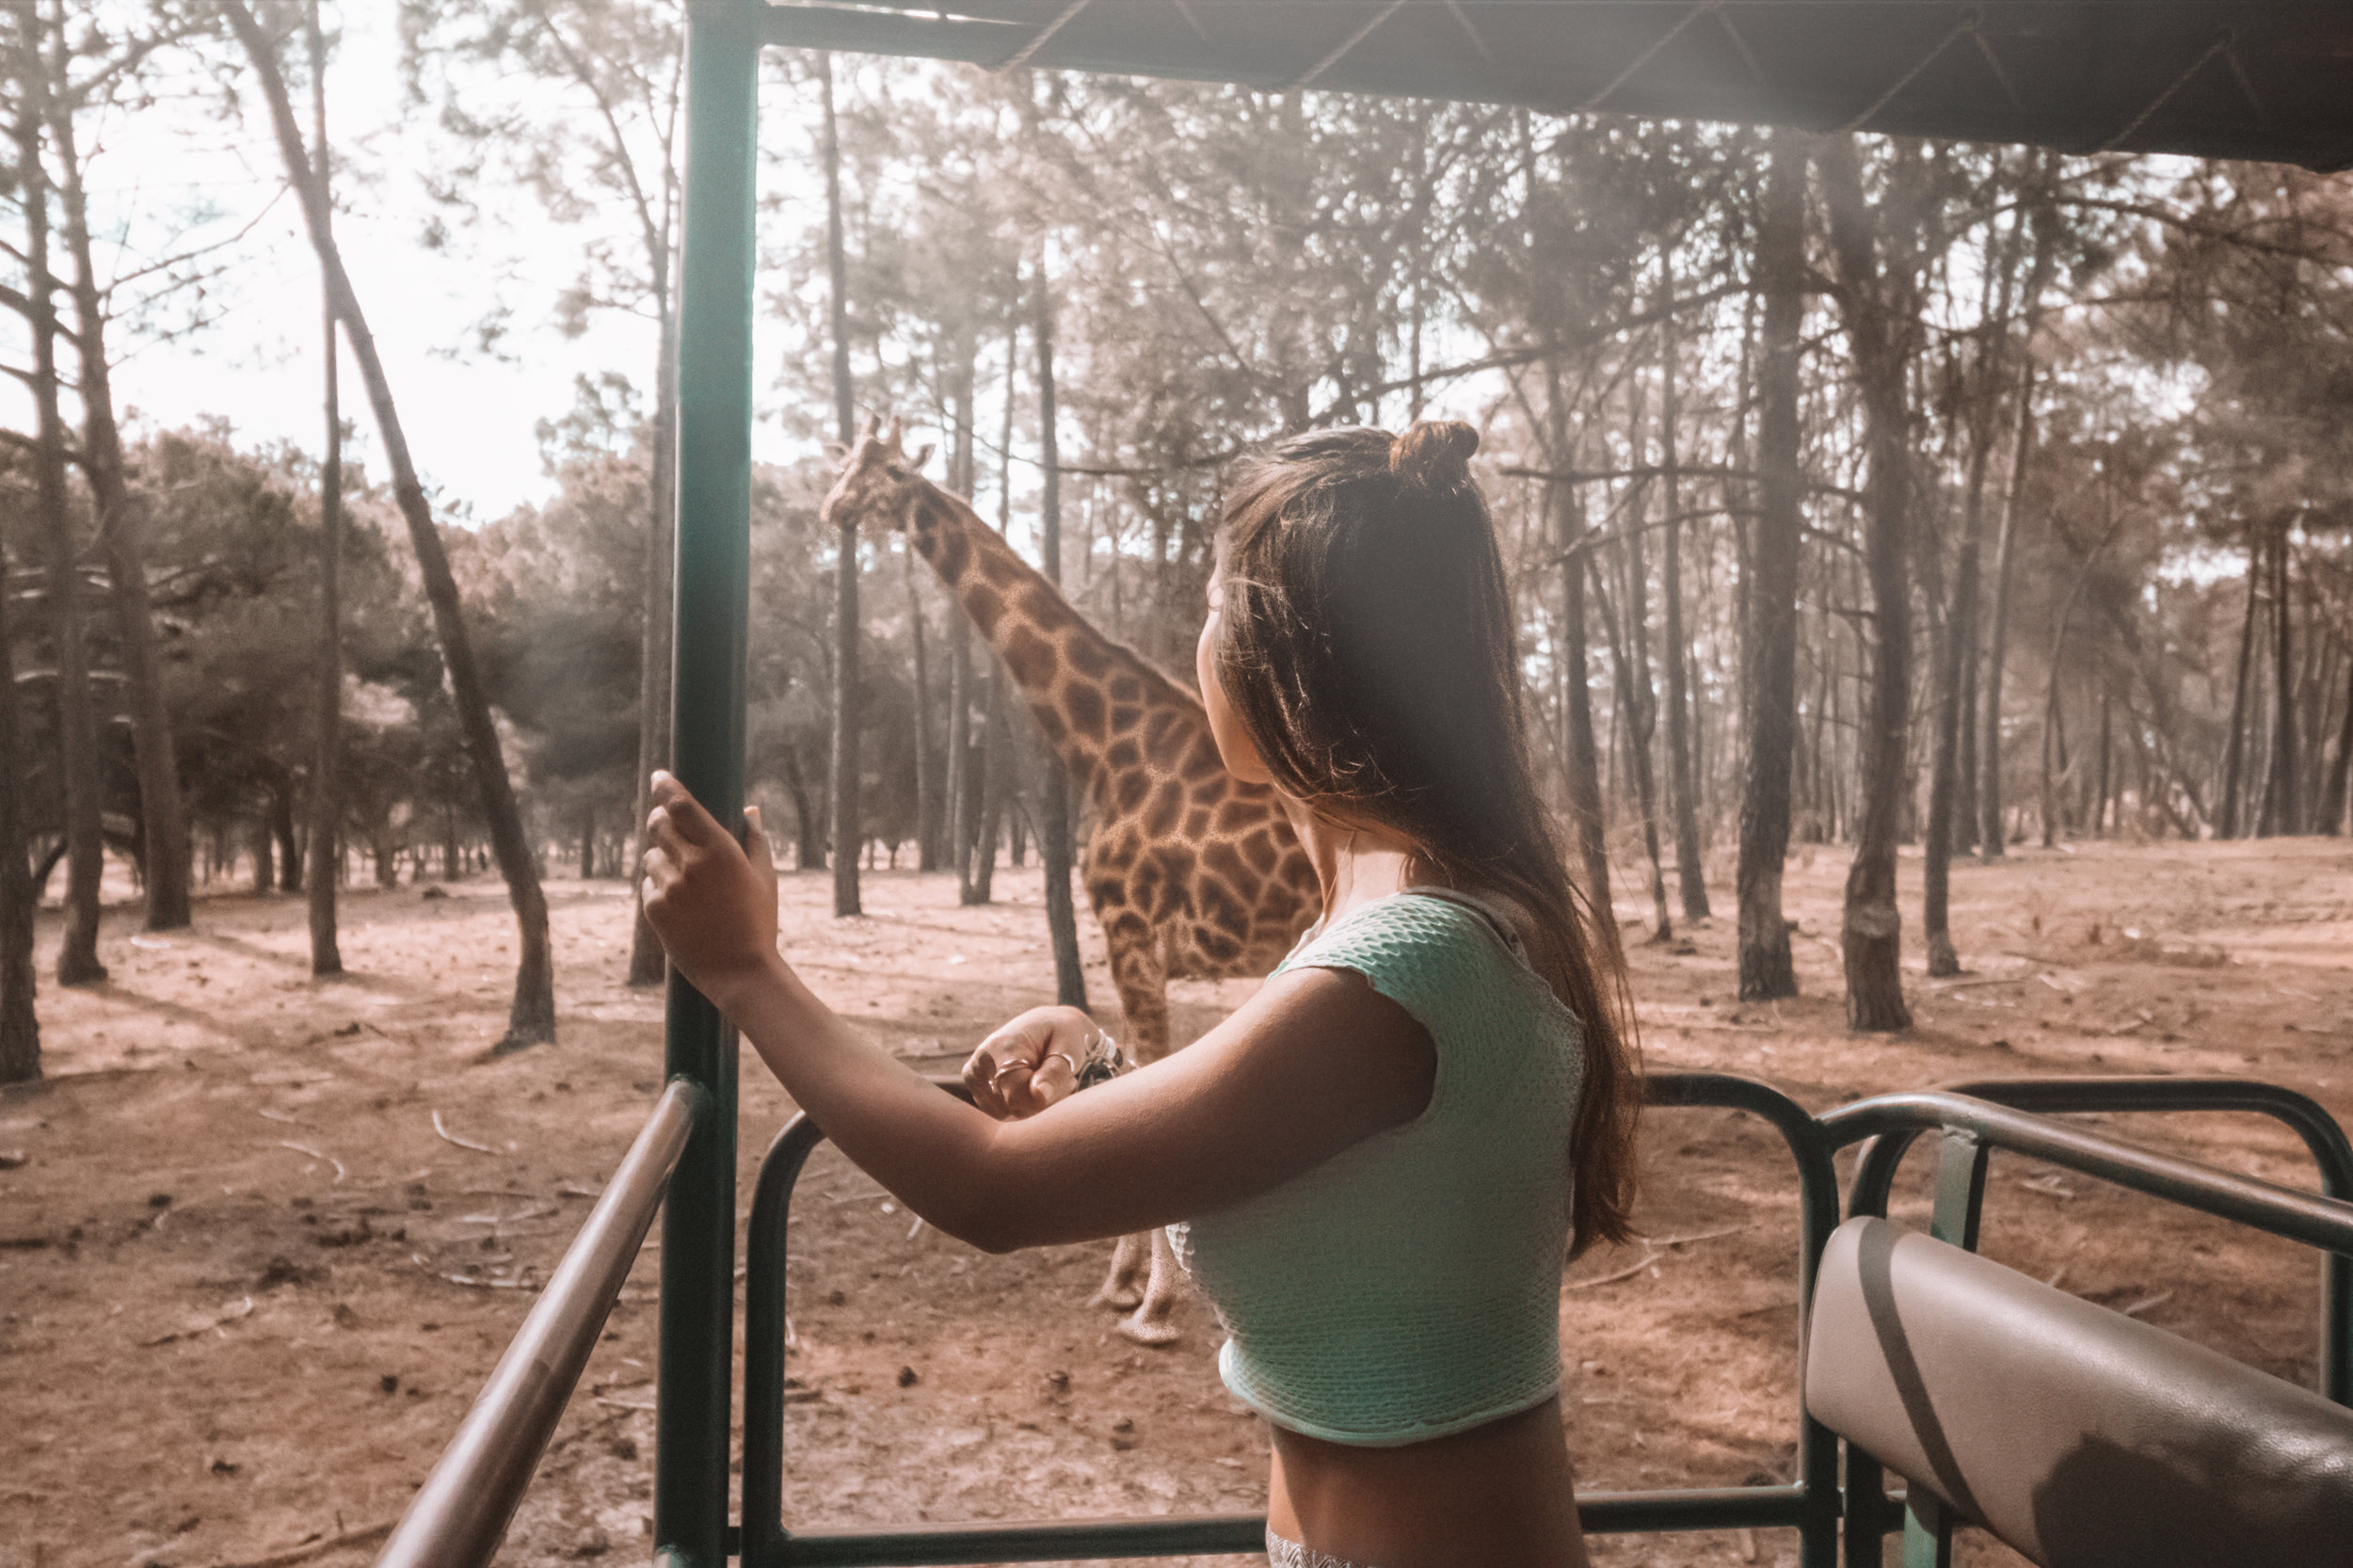 freeoversea at badoca safari park giraffe travel couple photography wildlife animals